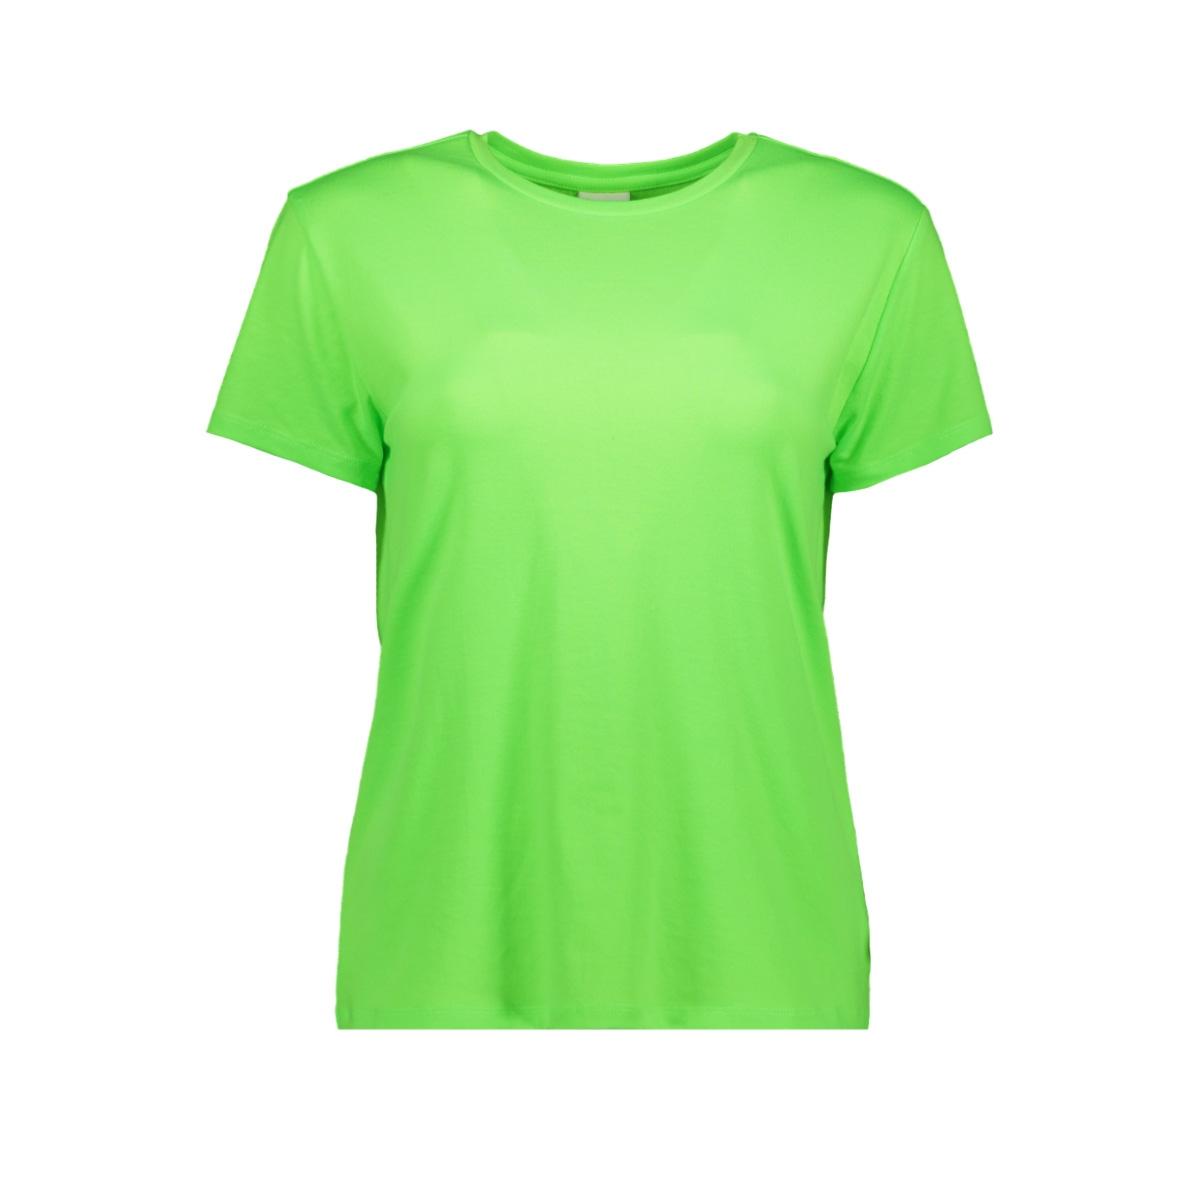 e2008199f0b0fb jdyniki s/s top jrs exp 15197546 jacqueline de yong t-shirt neon green